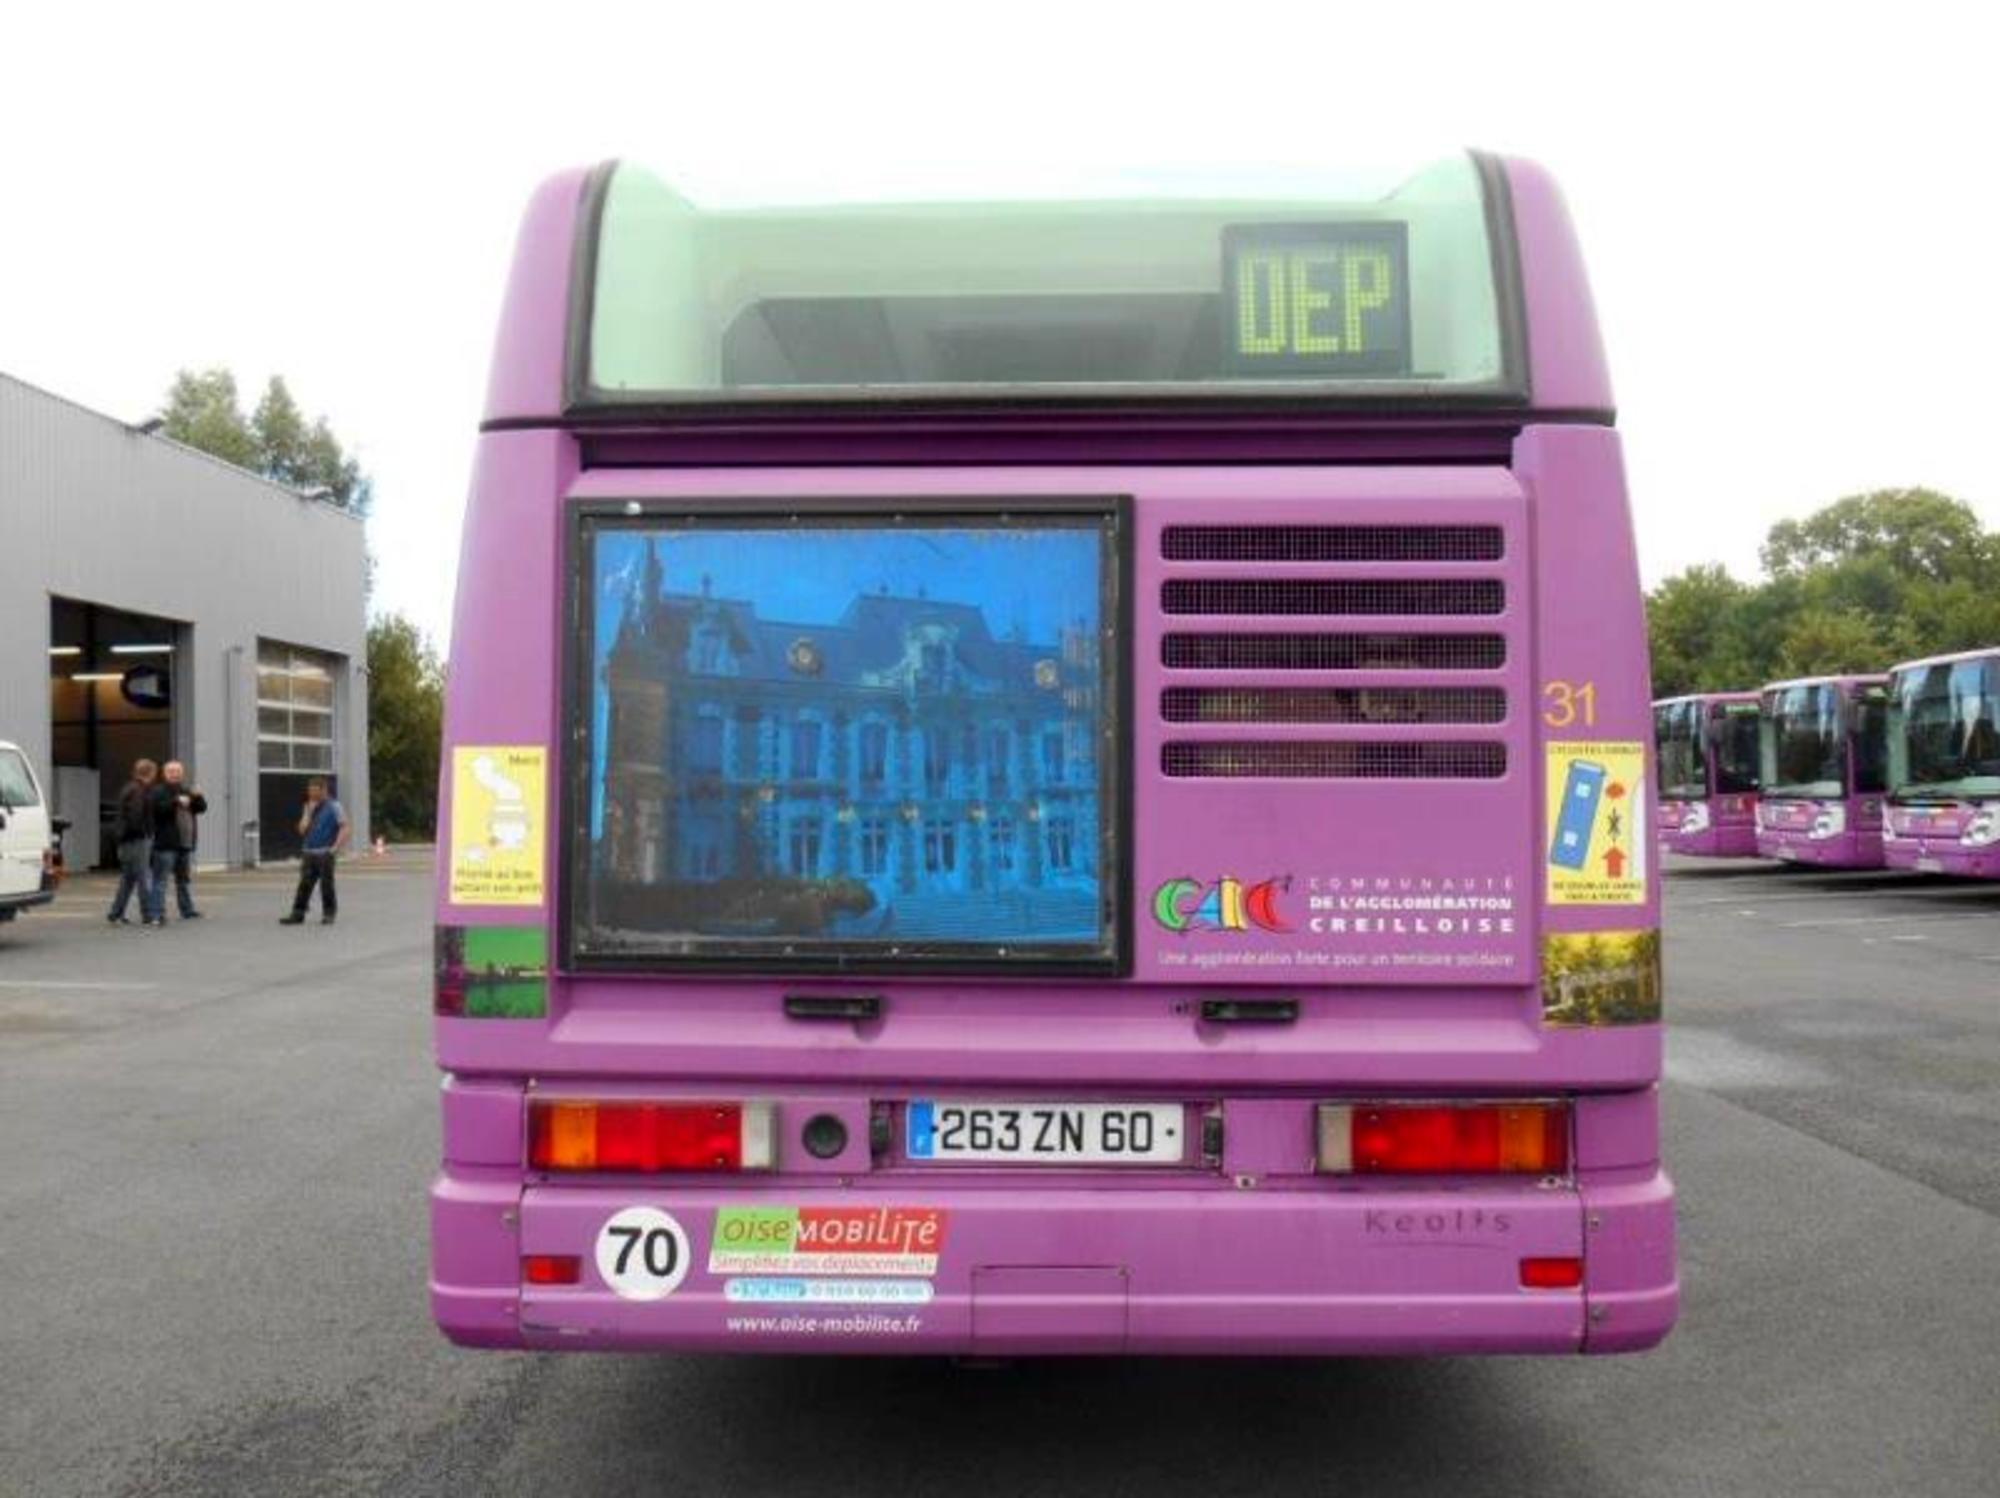 bus renault agora standard car bus d 39 occasion aux ench res agorastore. Black Bedroom Furniture Sets. Home Design Ideas